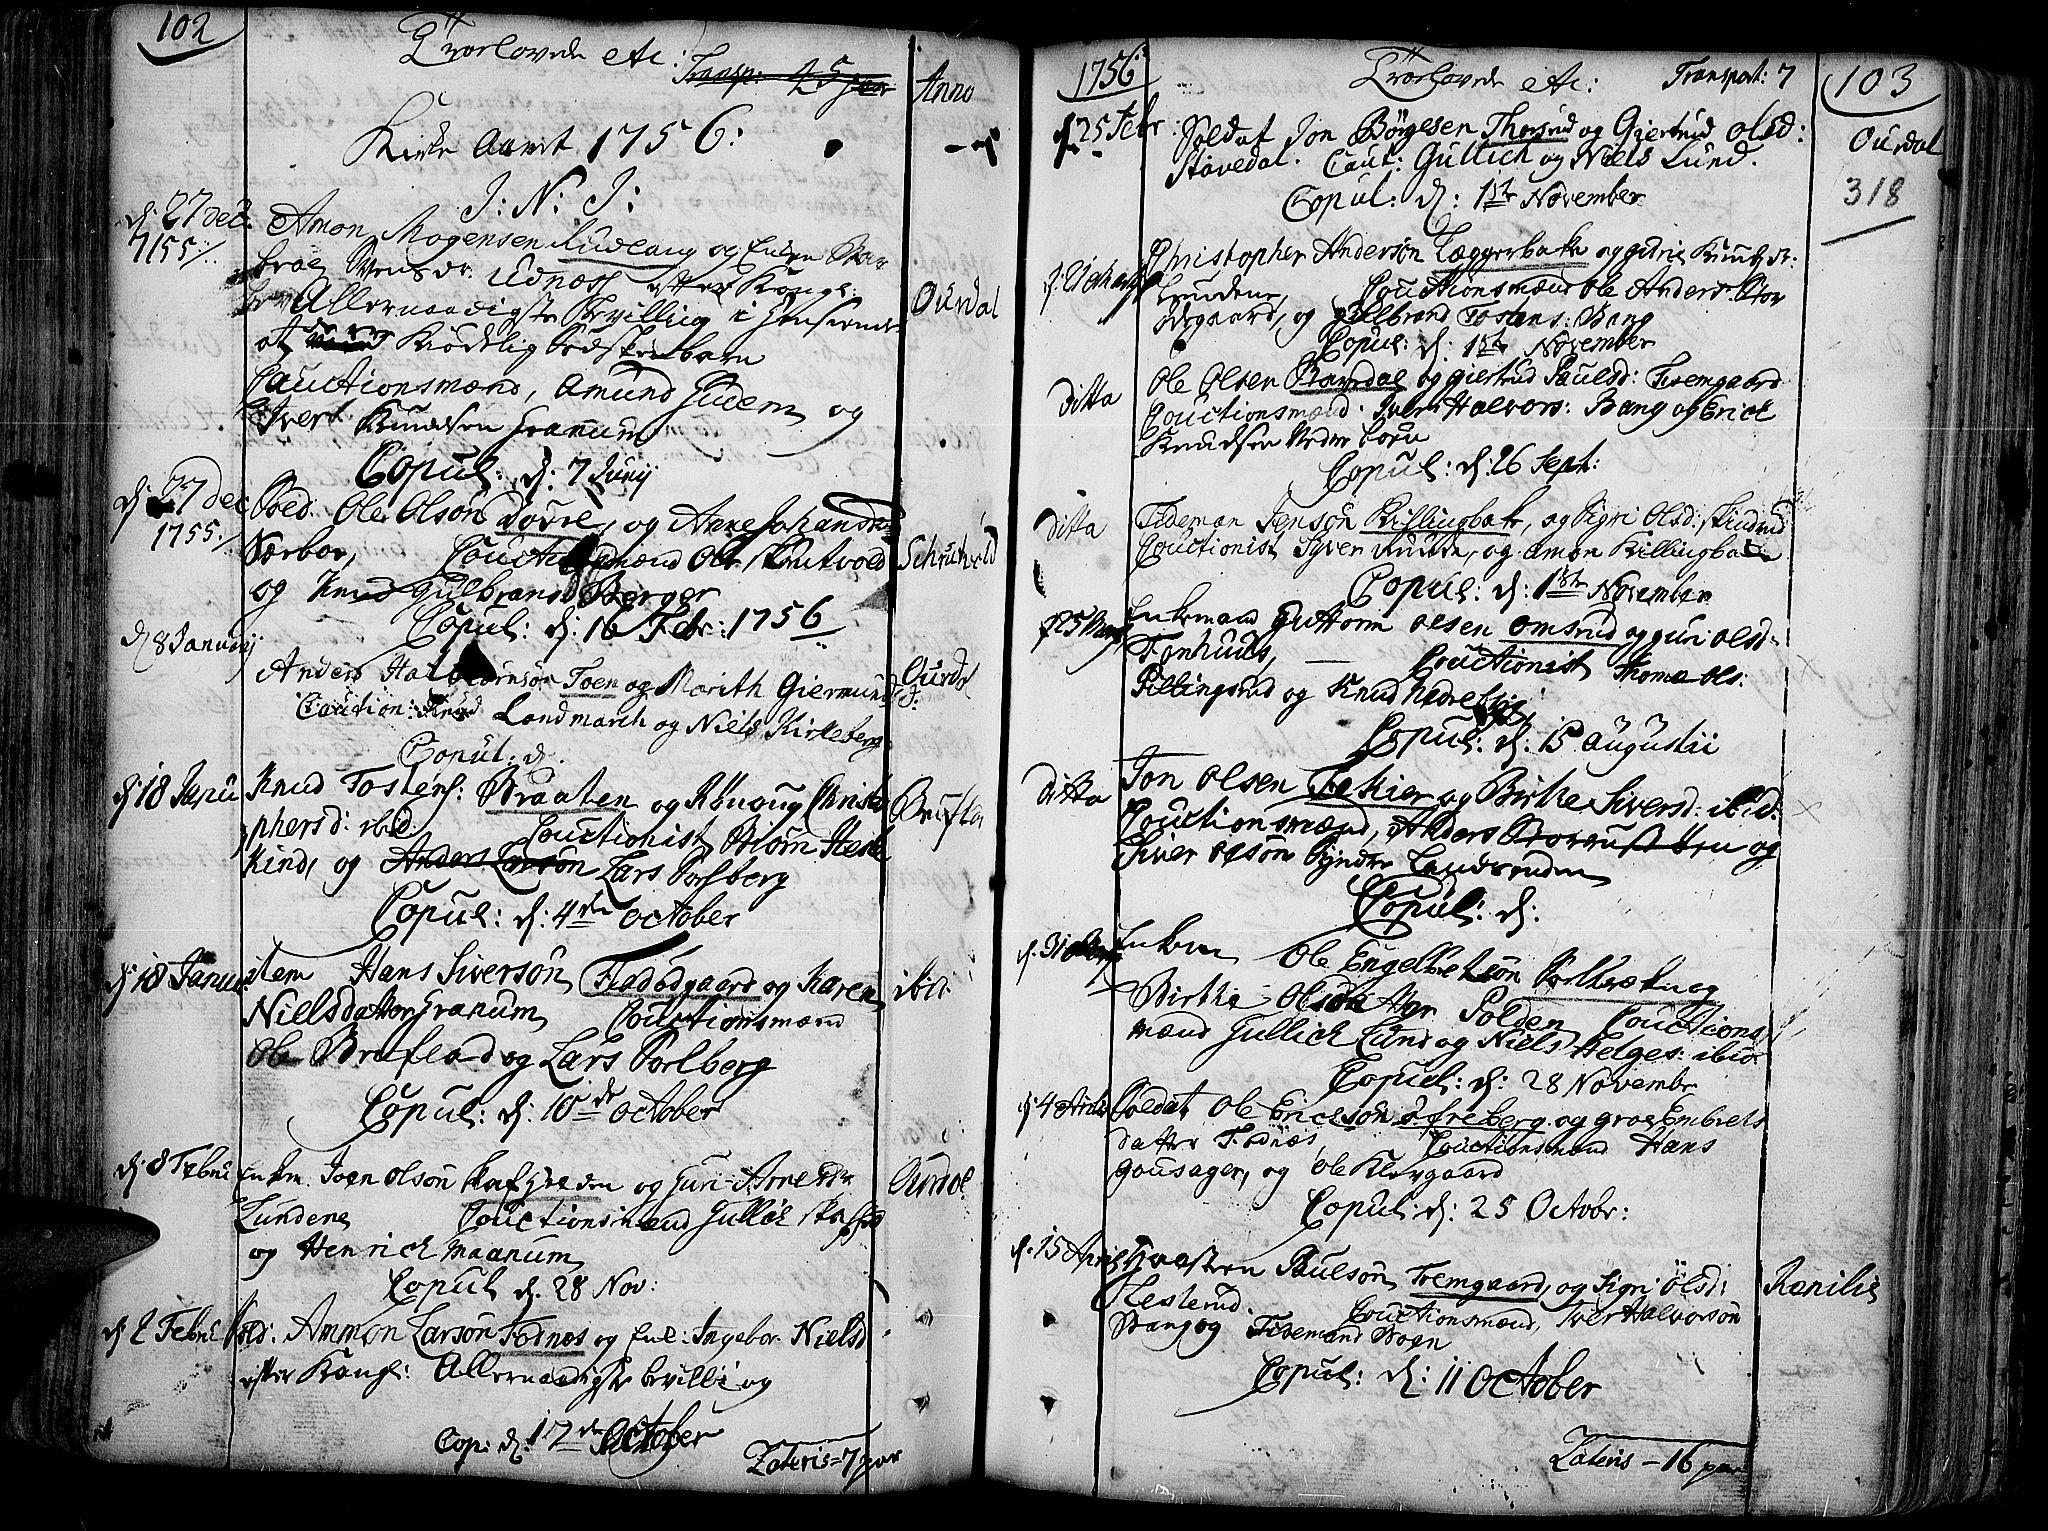 SAH, Aurdal prestekontor, Ministerialbok nr. 4, 1730-1762, s. 102-103